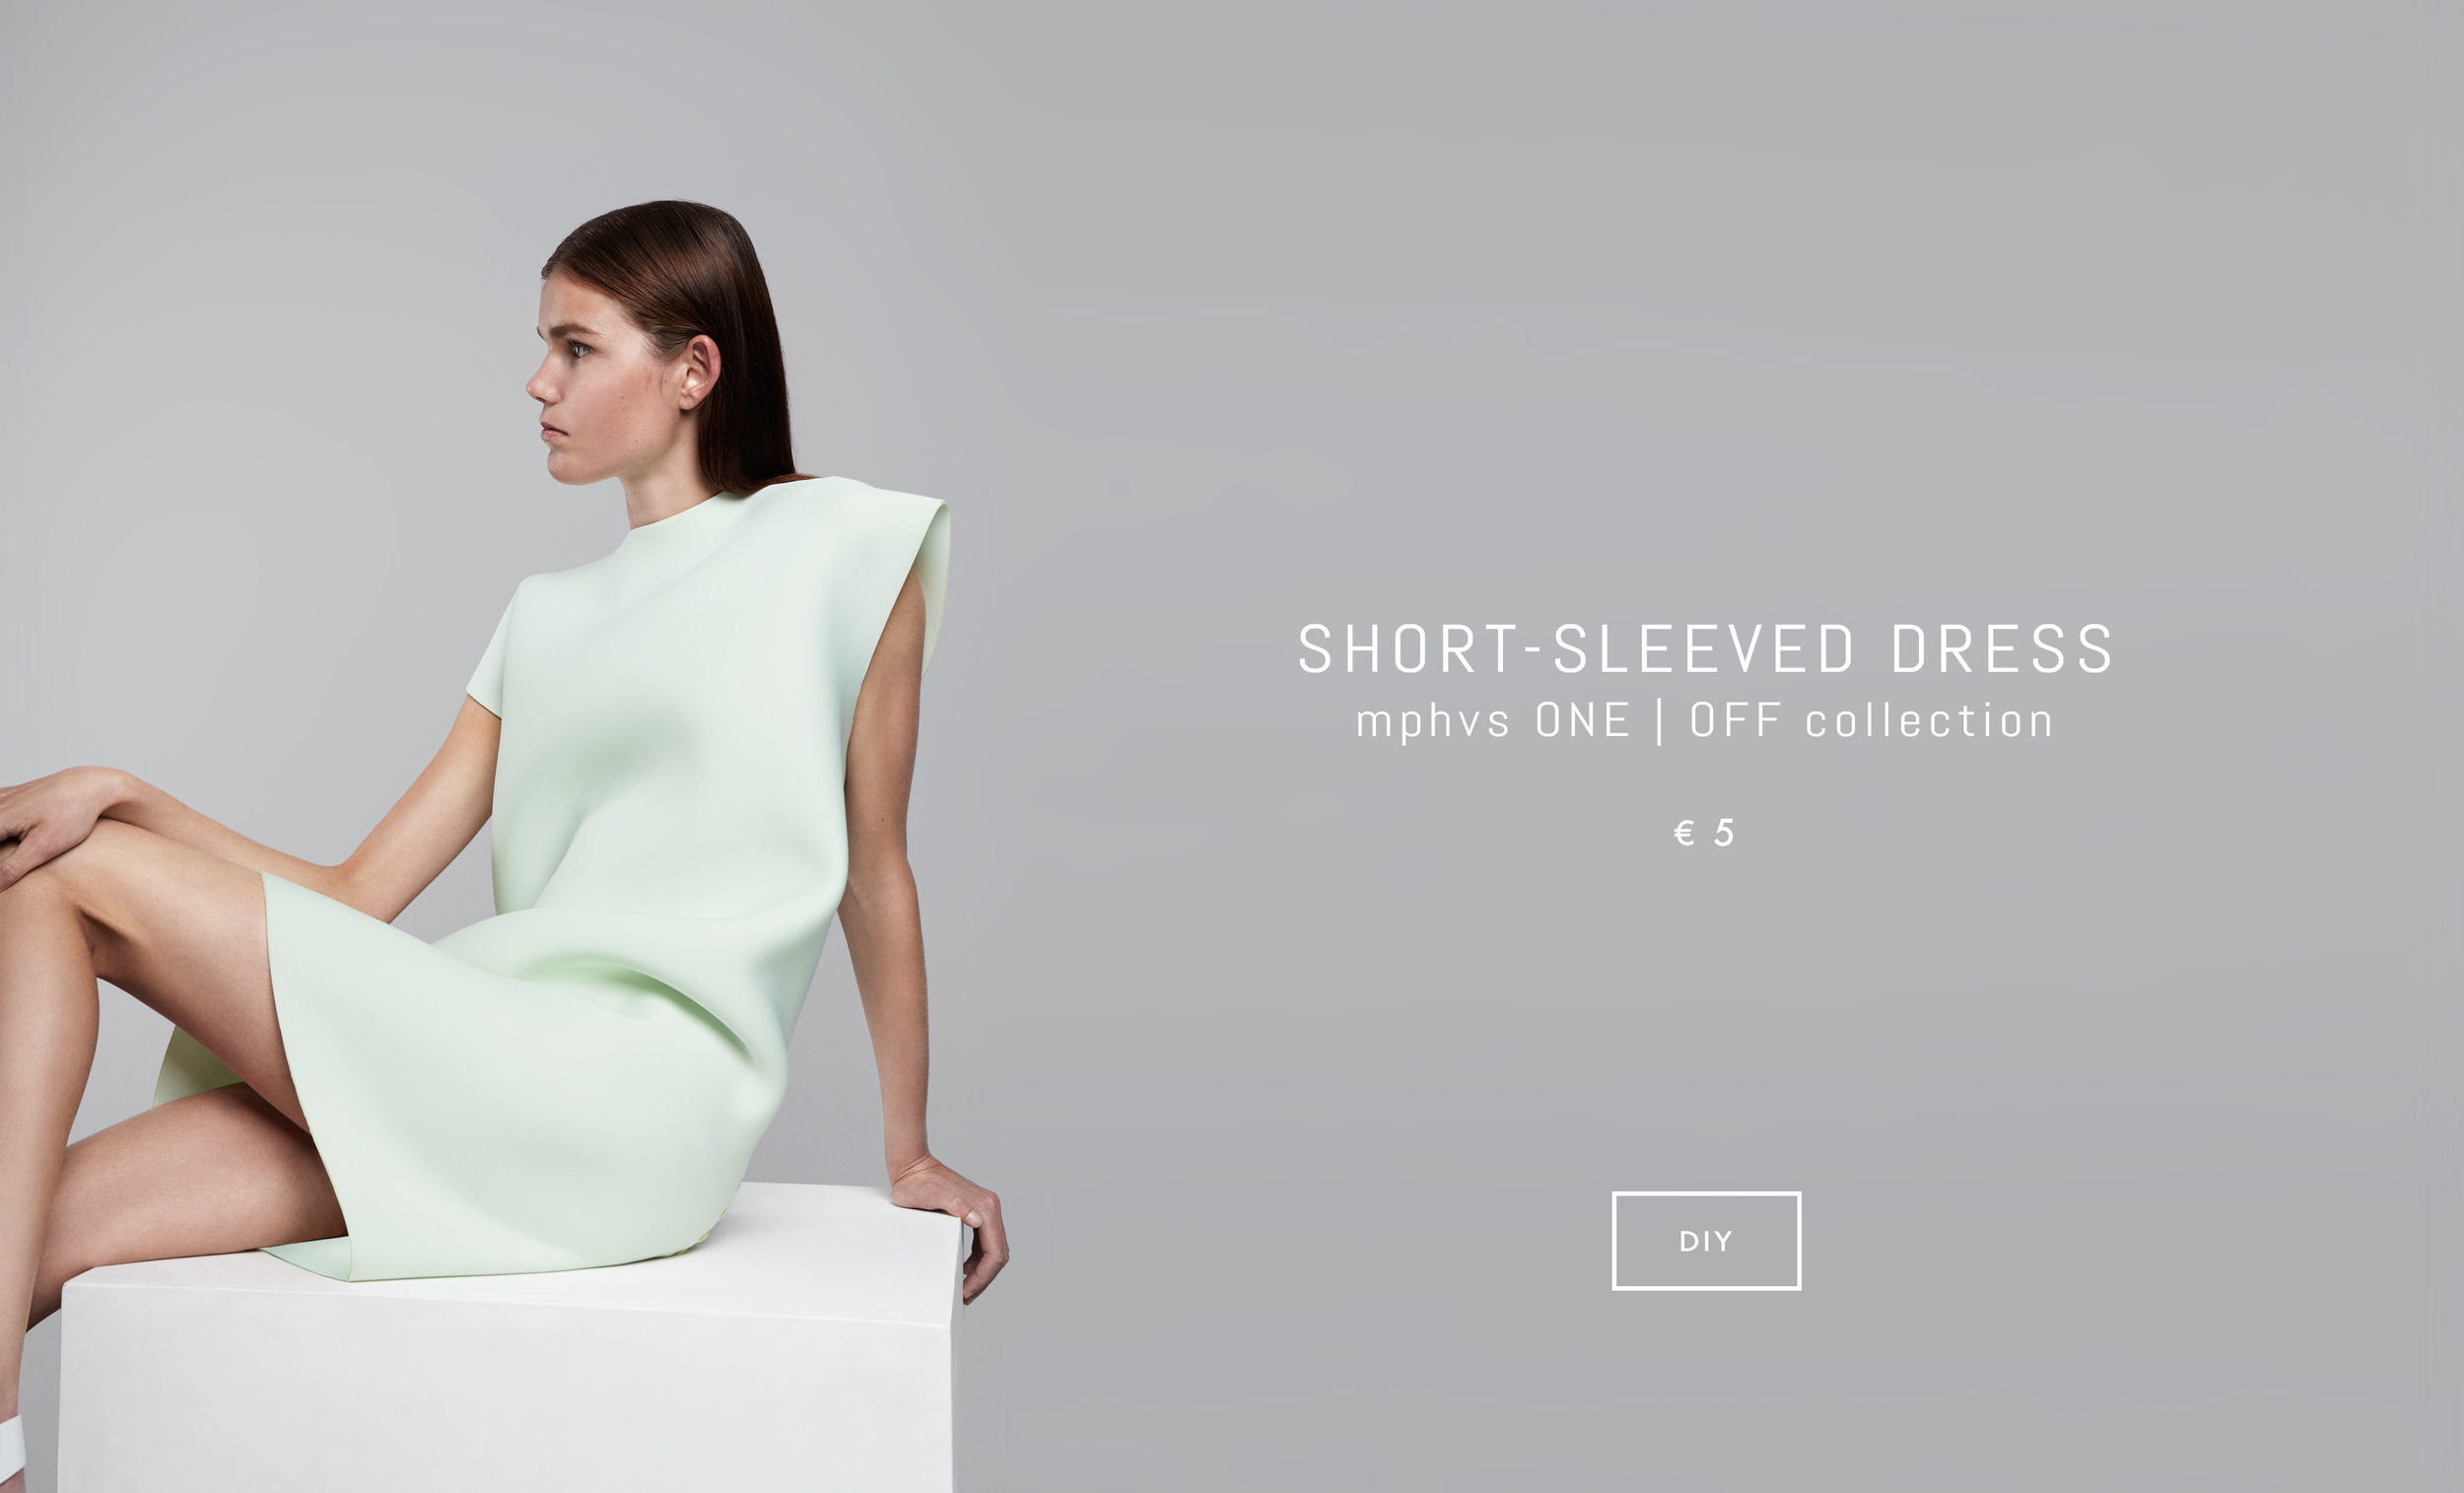 shop_dress_diy.jpg